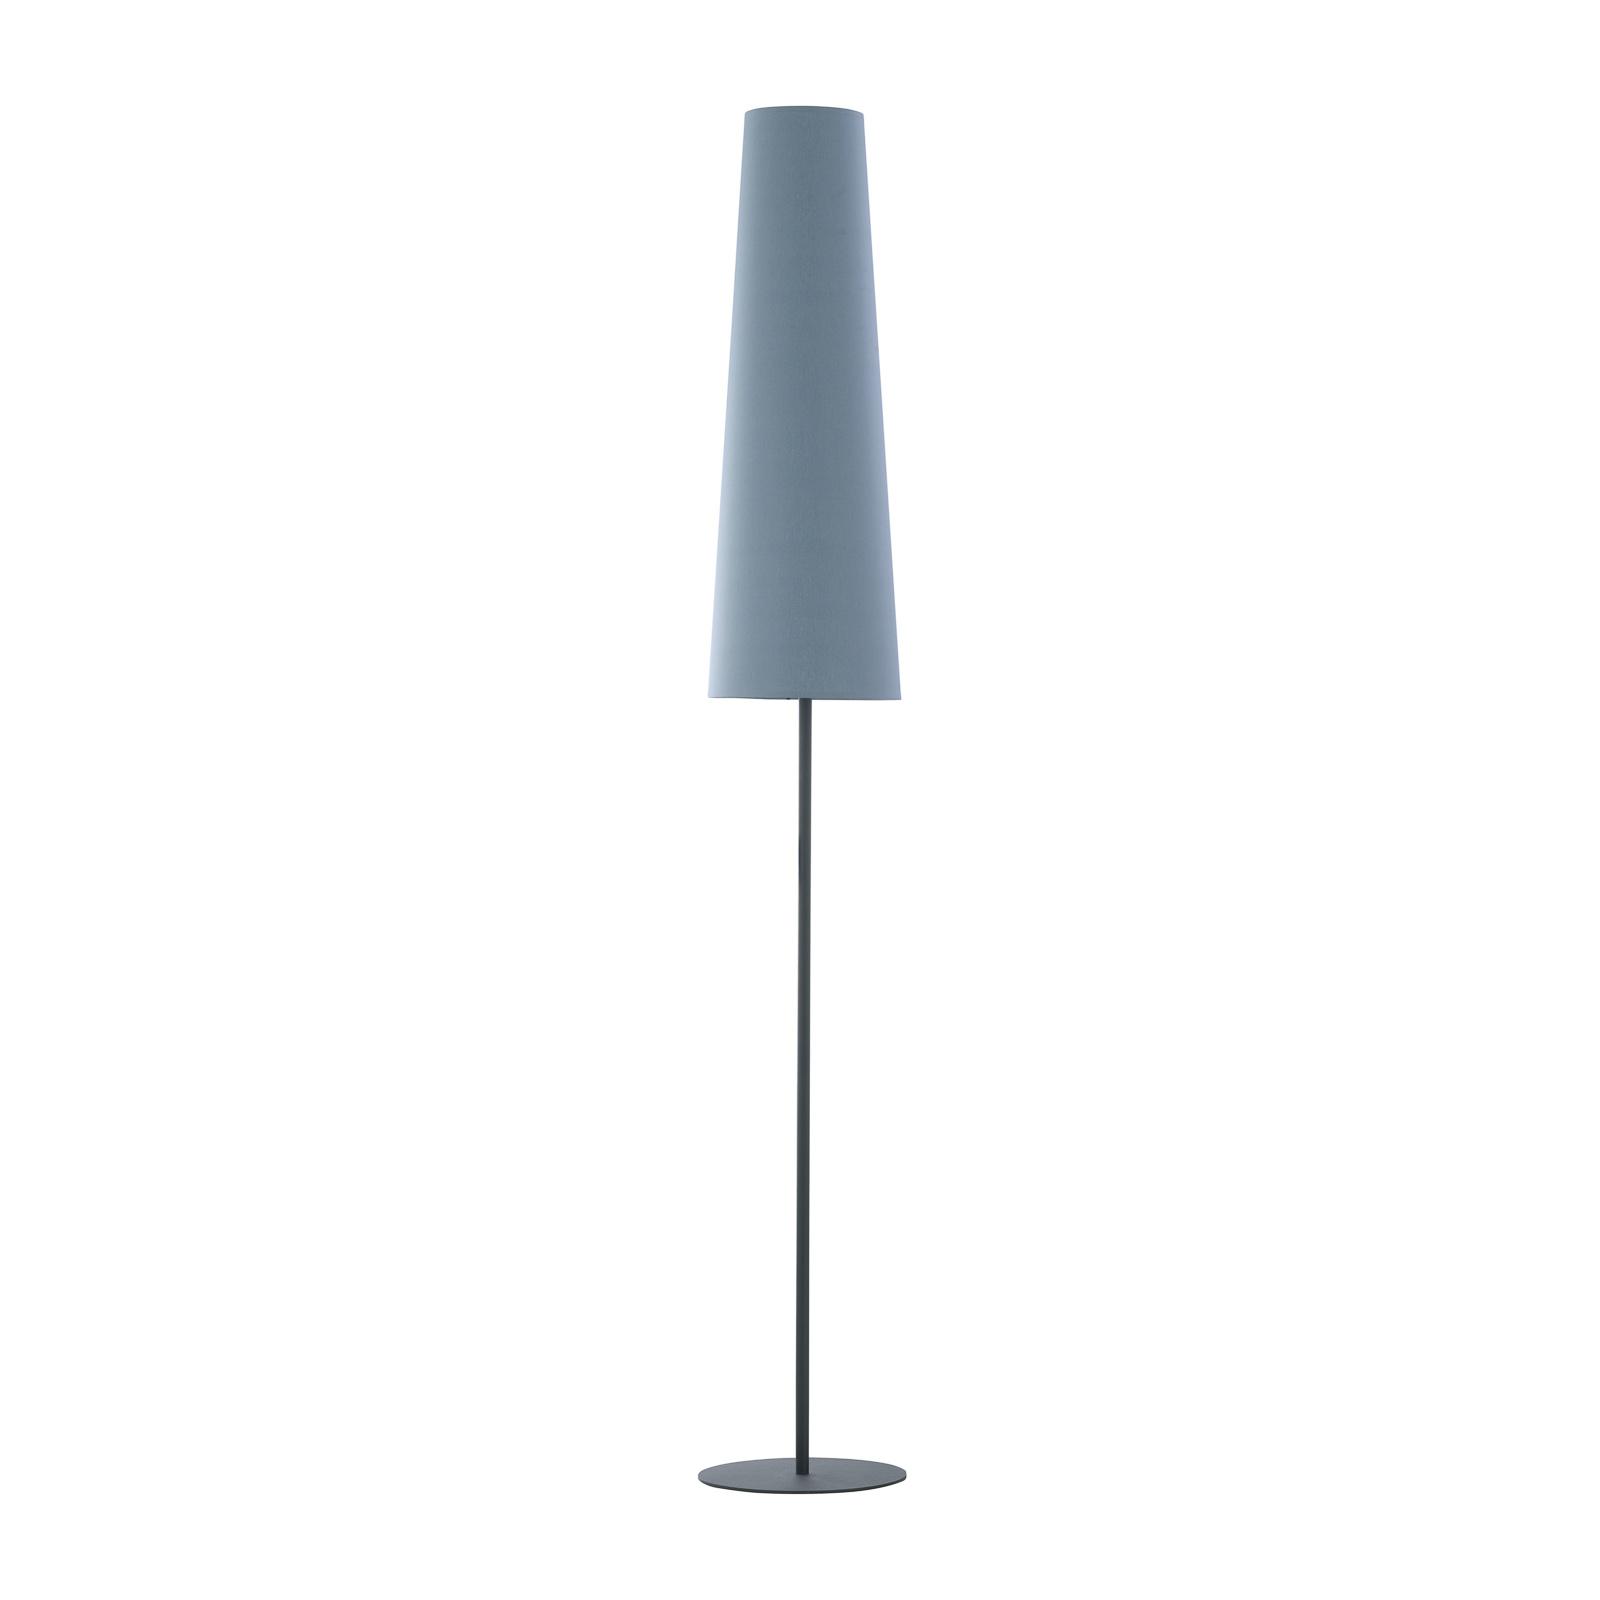 Piantana Umbrella, altezza 168 cm, blu